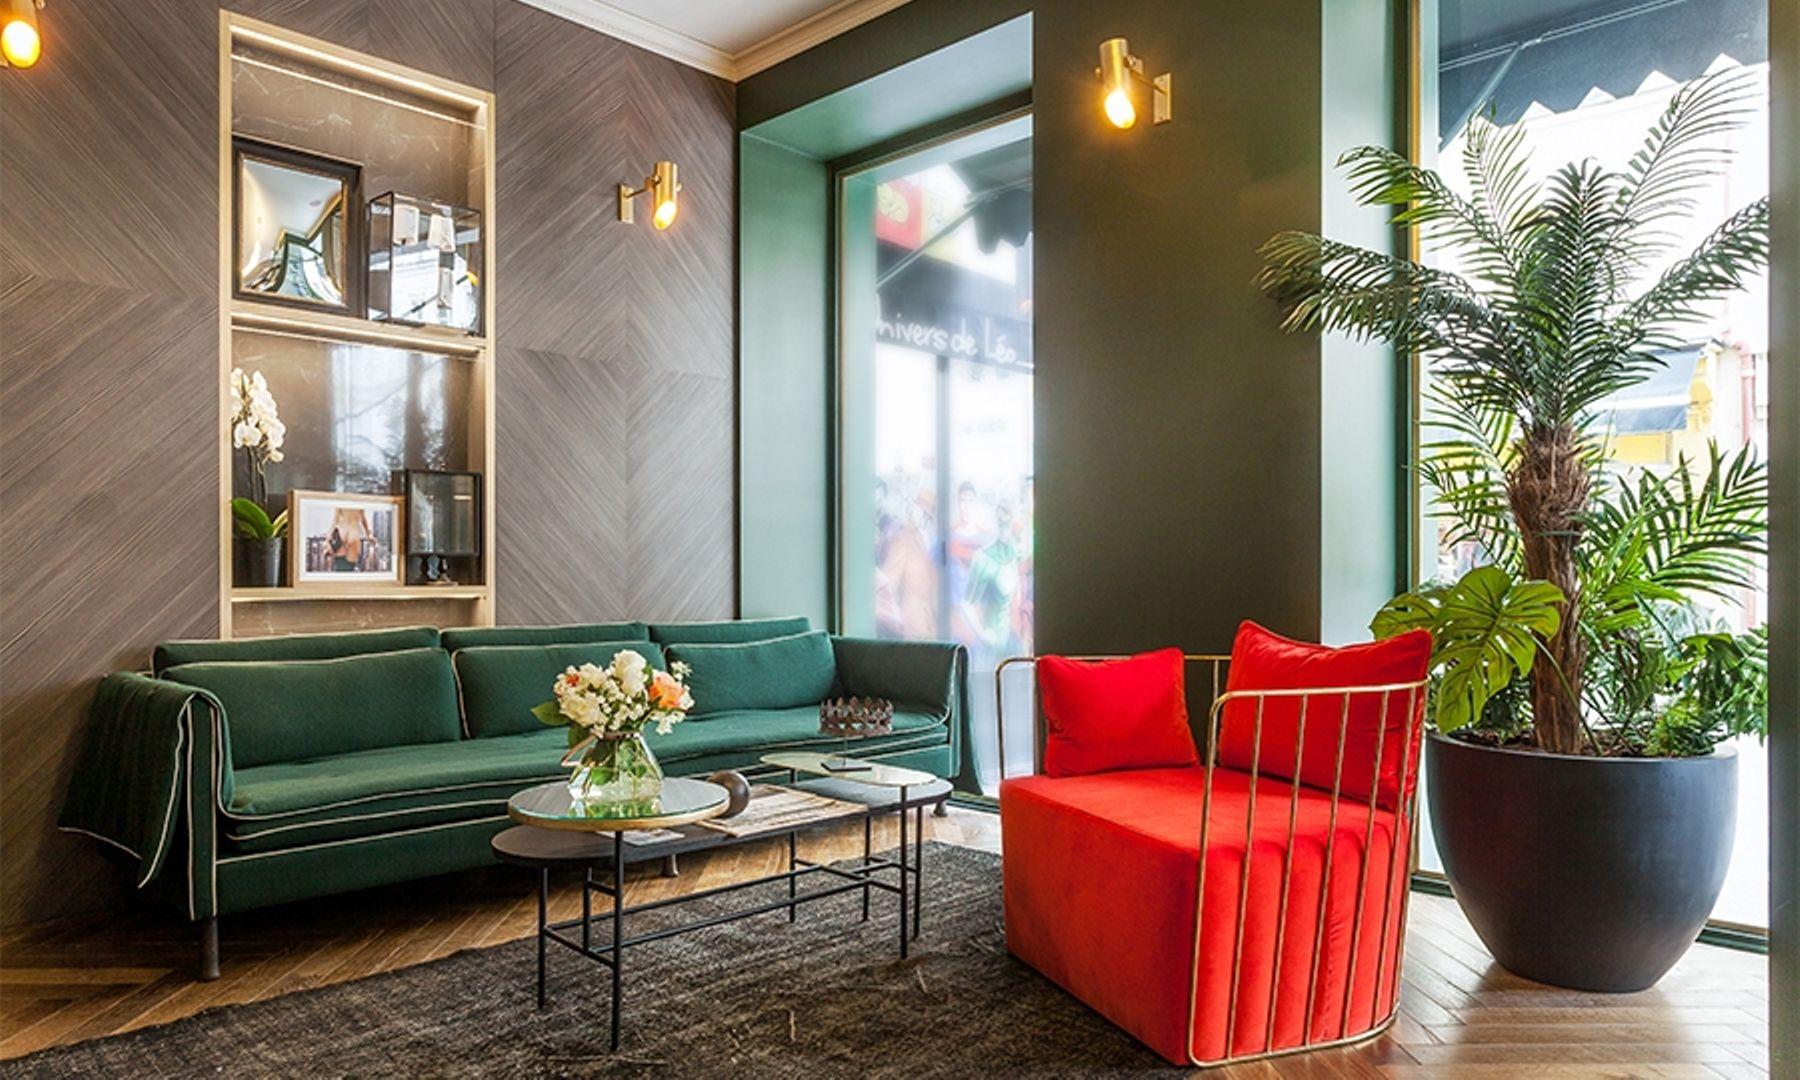 Handsome Hotel By Elegancia - Paris